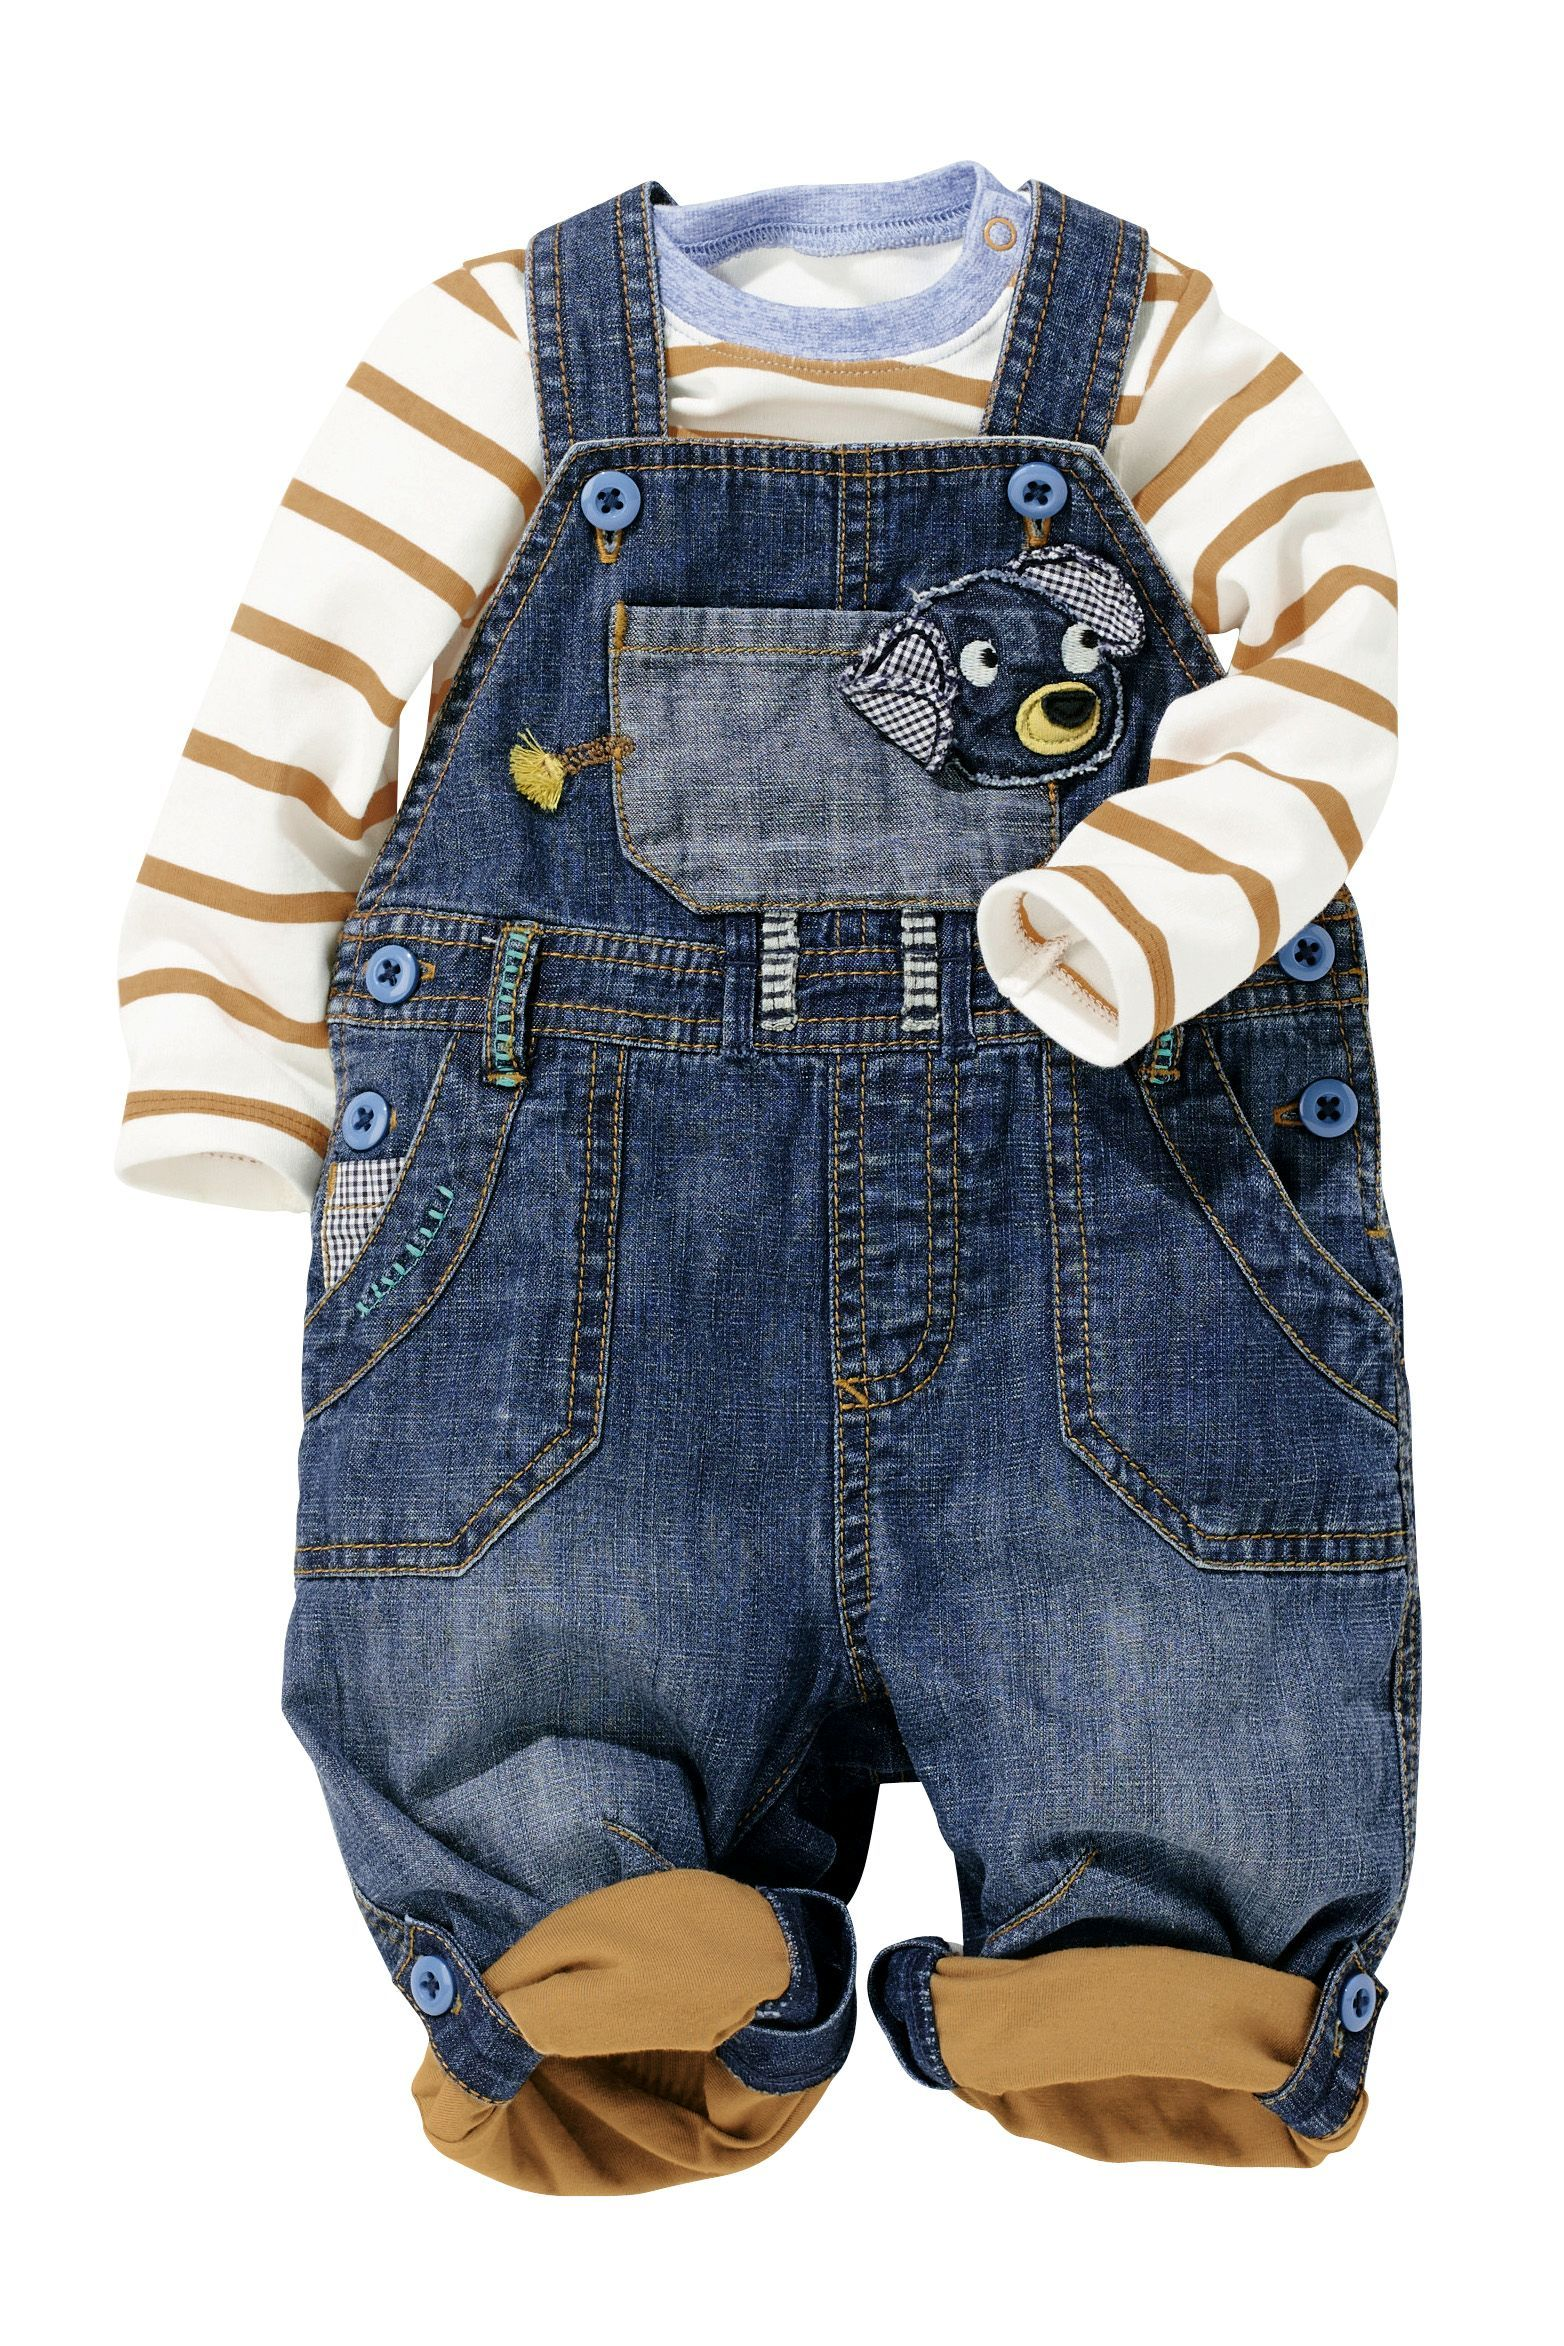 Ihram Kids For Sale Dubai: Buy Denim Dog Dungarees And Bodysuit Two Piece Set (0